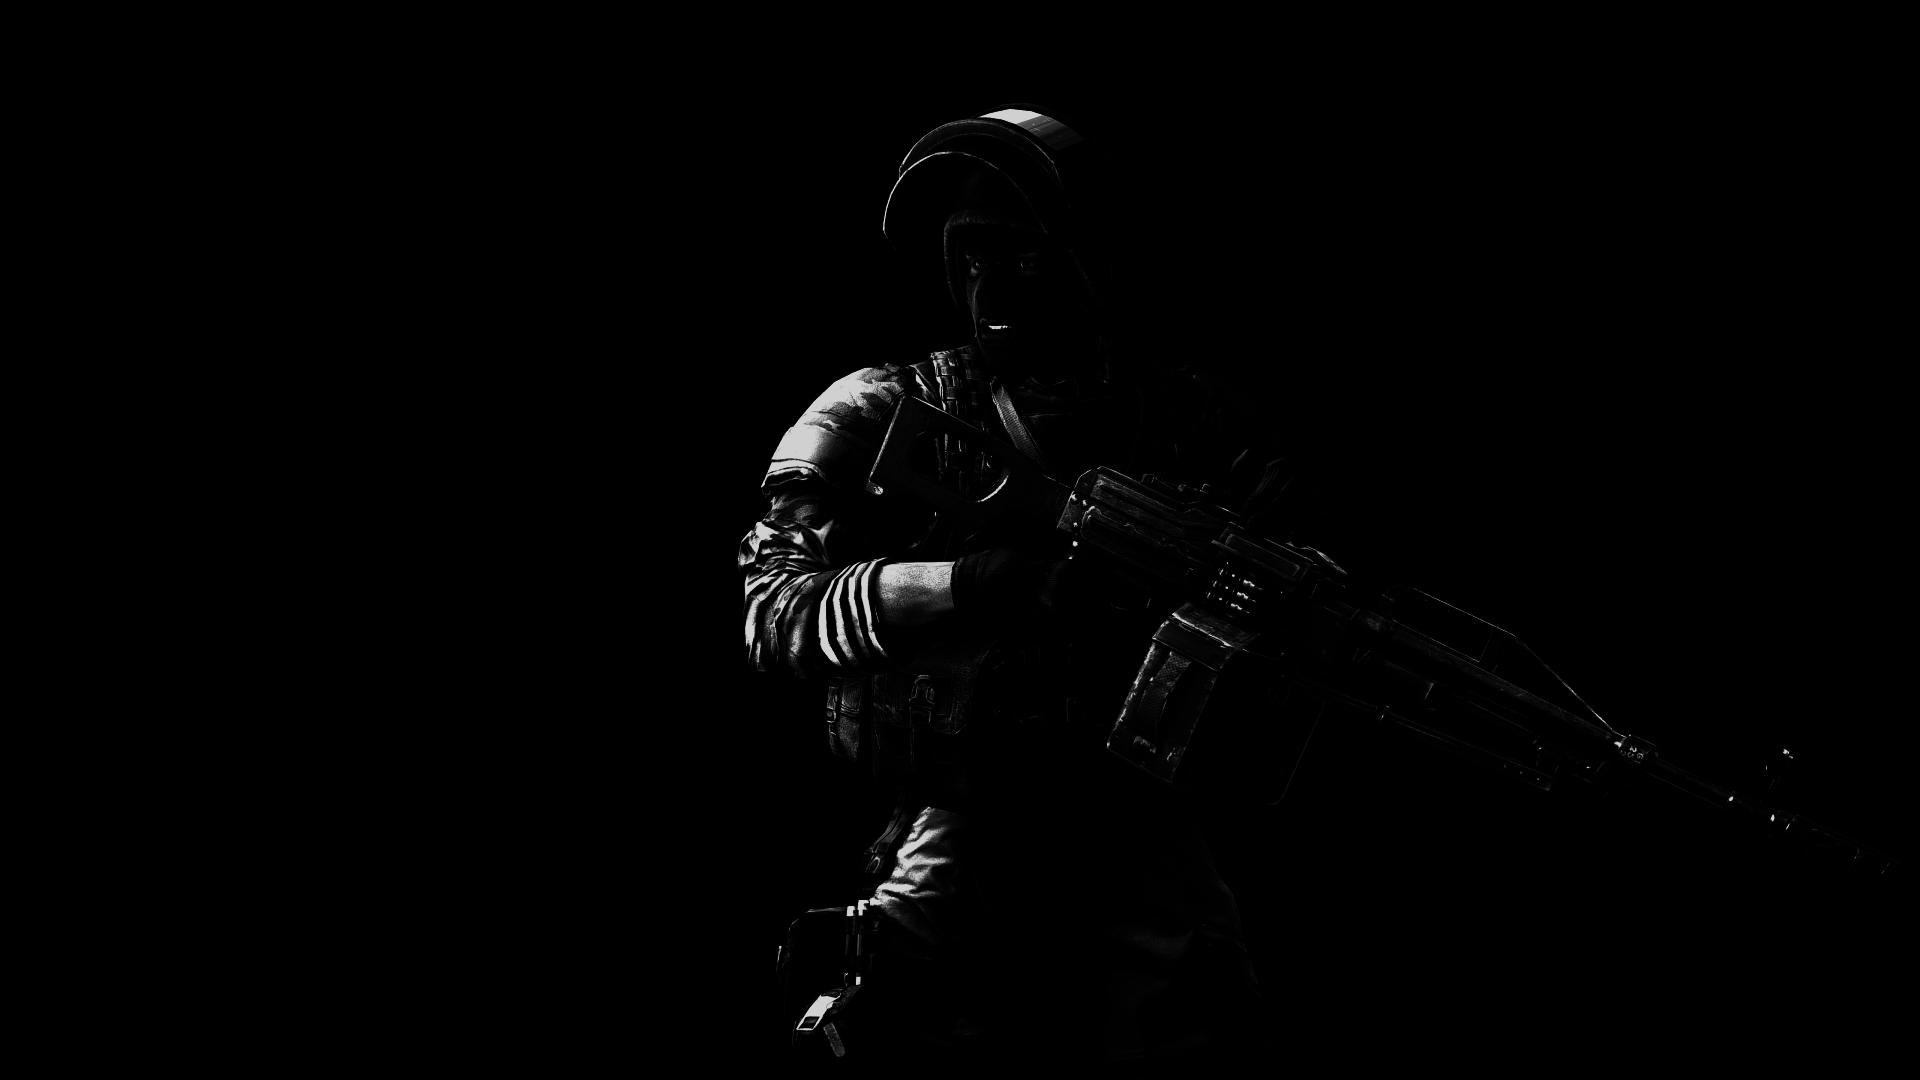 Battlefield 4 5k Retina Ultra Fond D'écran HD